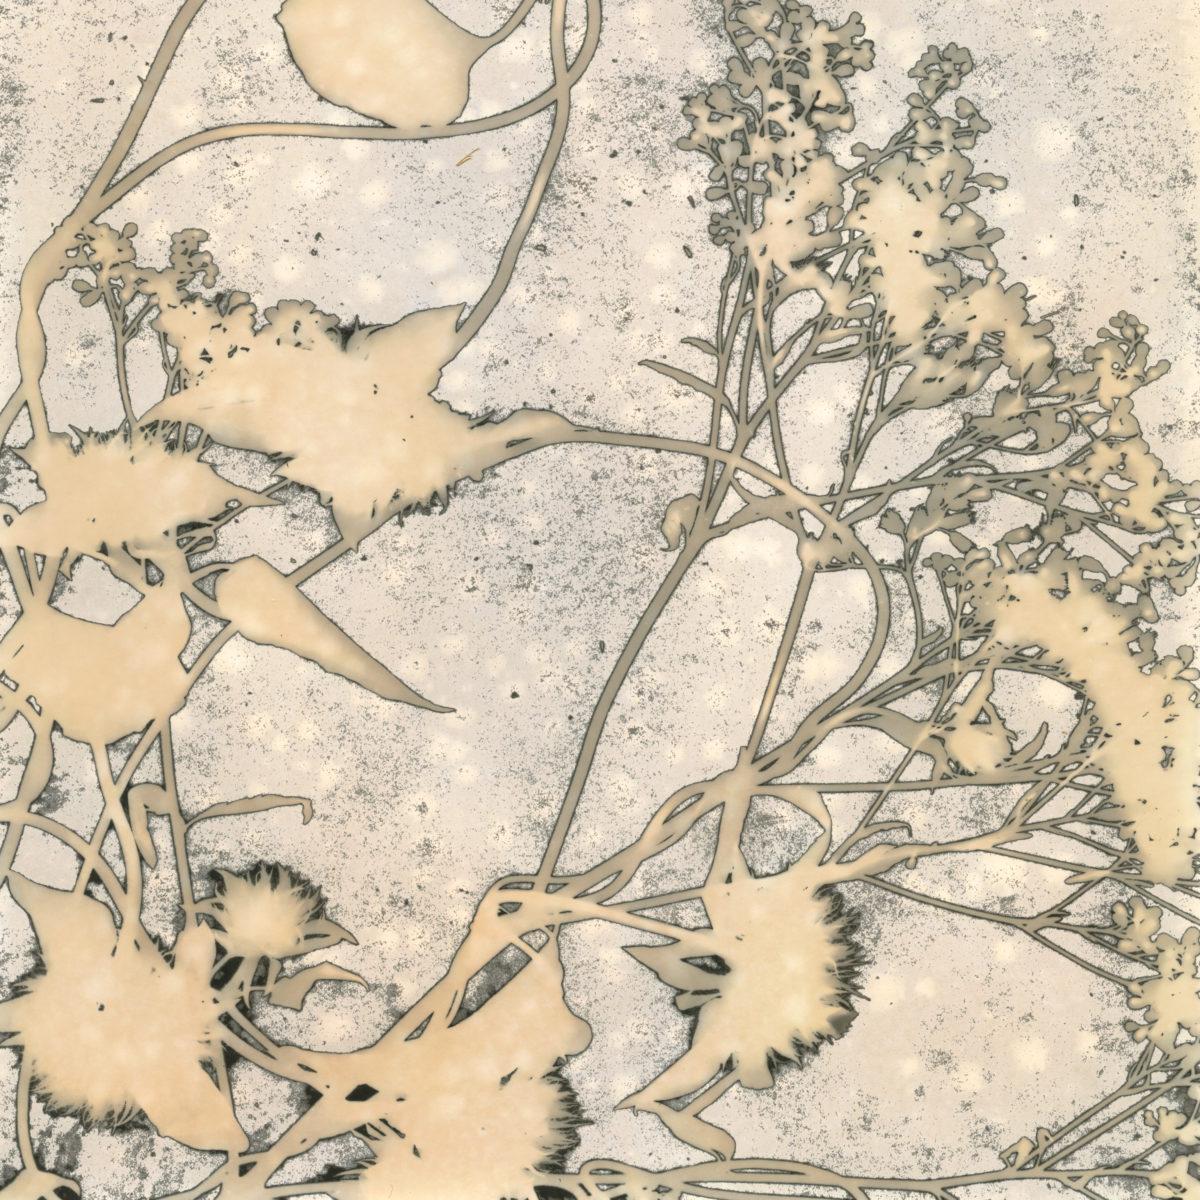 AugustReverie#3_ArtHunt_Dropbox -May-Perkins-Benton